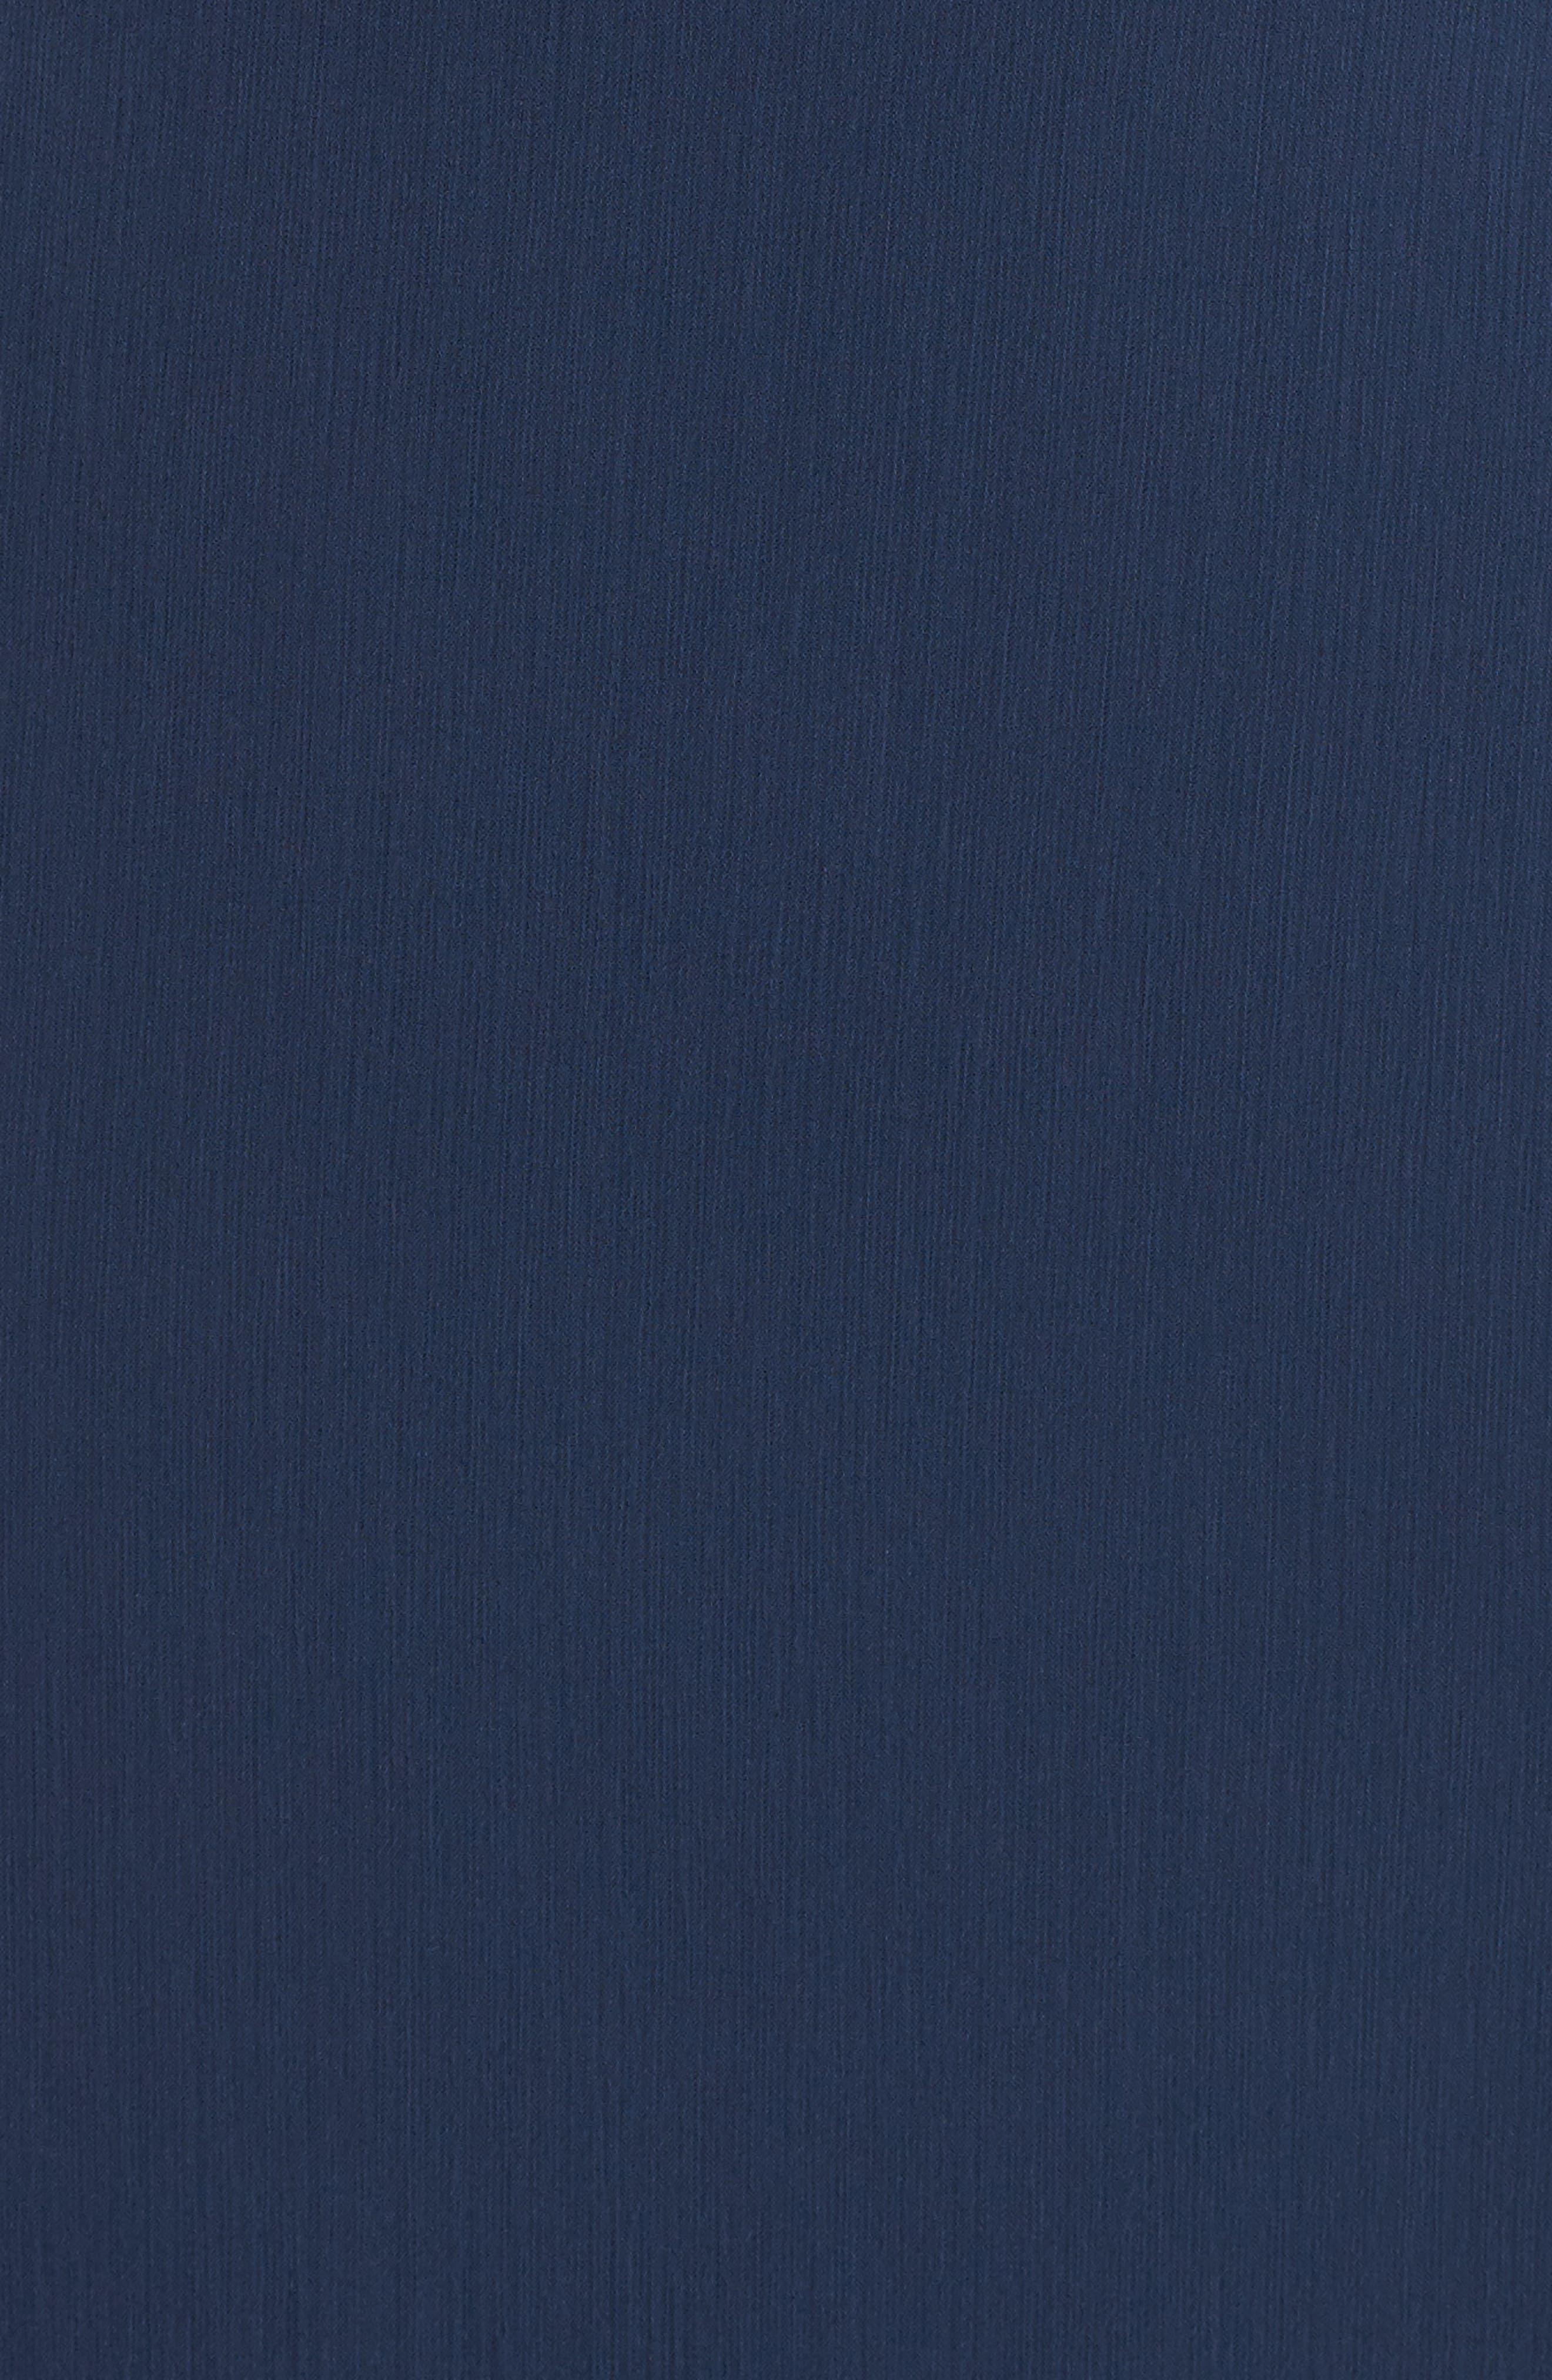 Lauren Cold Shoulder Tiered Gown,                             Alternate thumbnail 15, color,